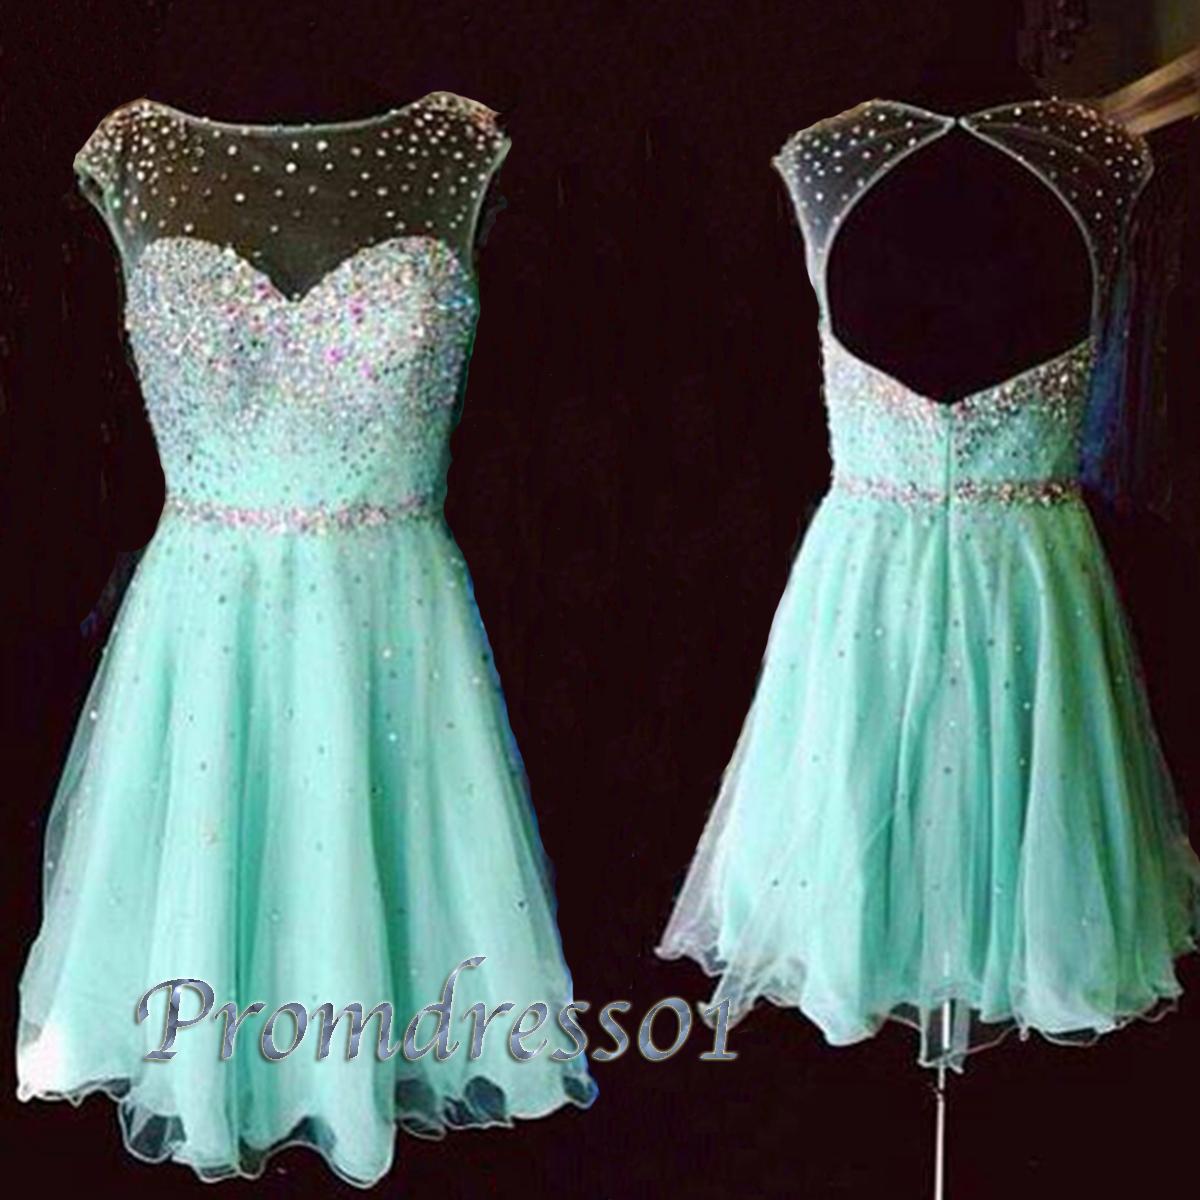 Aqua blue handmade backless short evening dress